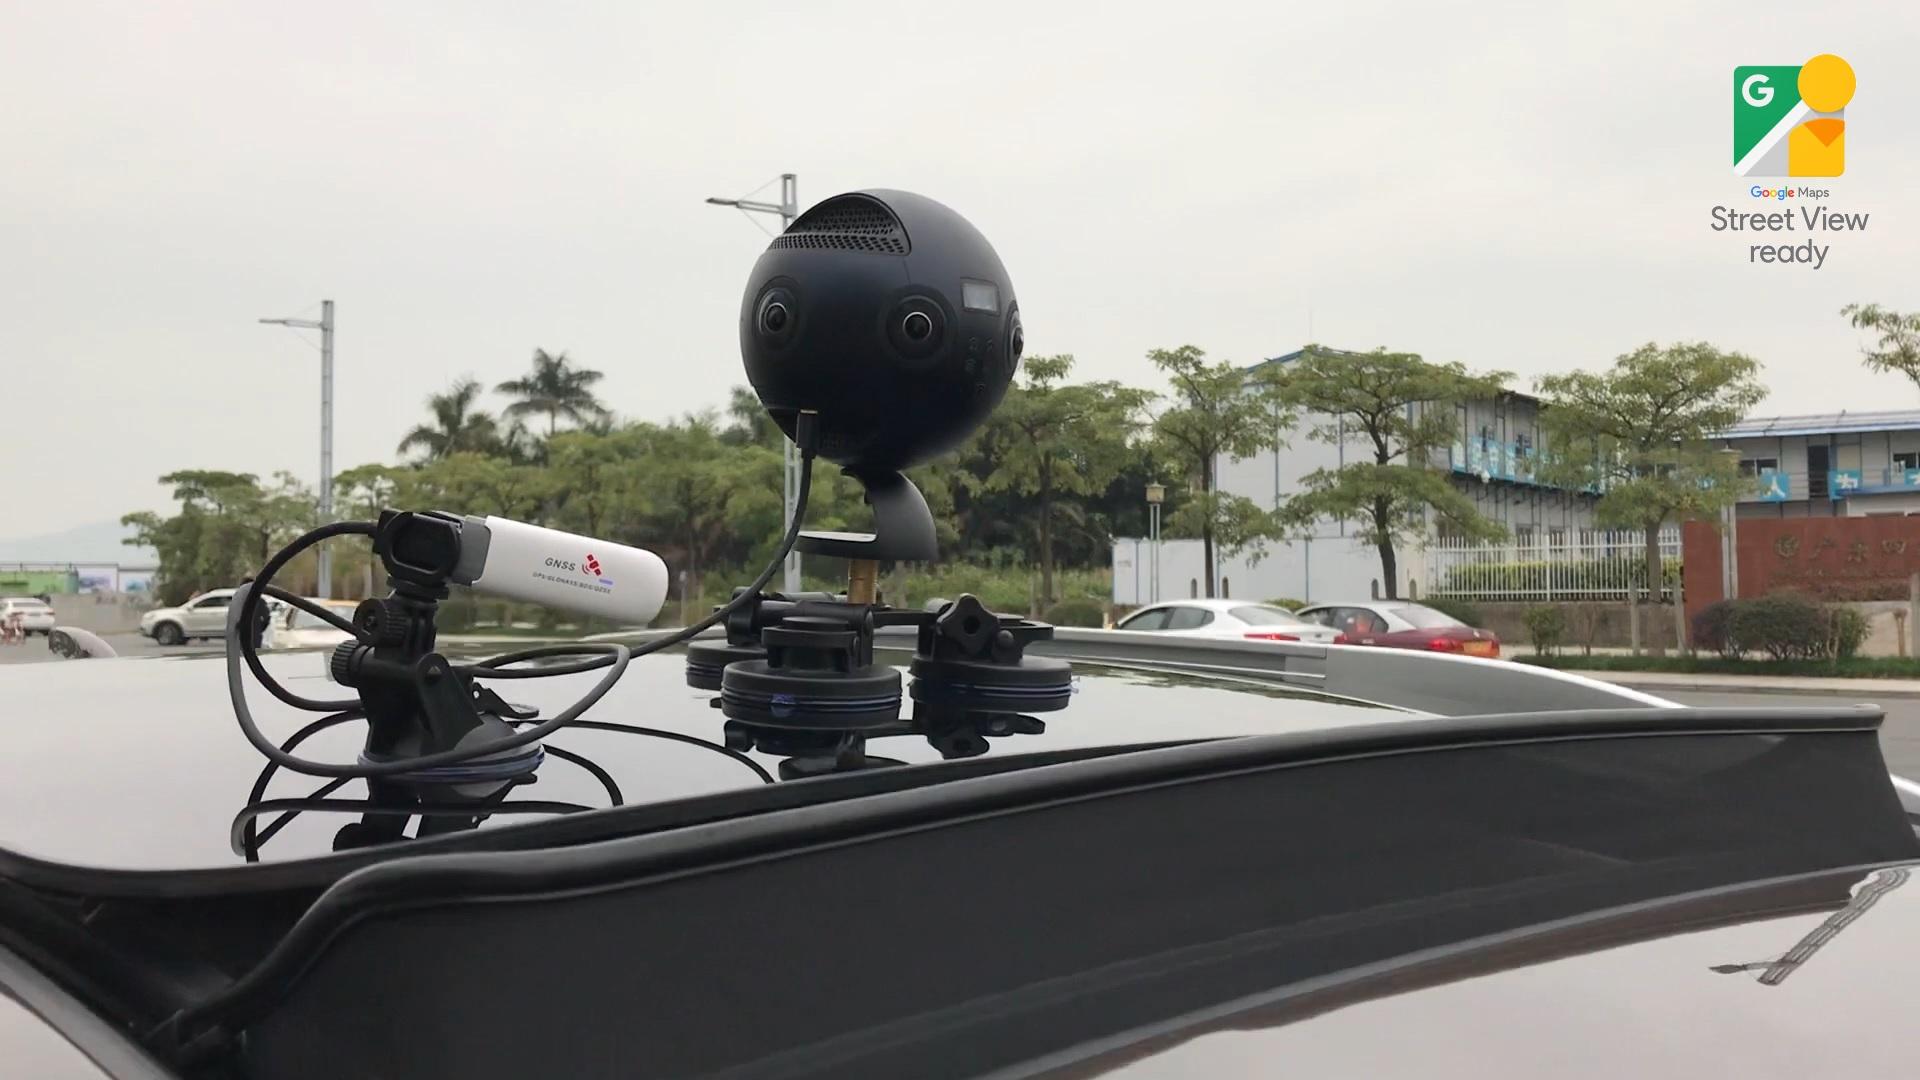 Insta360 Proカメラ - Googleが「street view ready」に採用